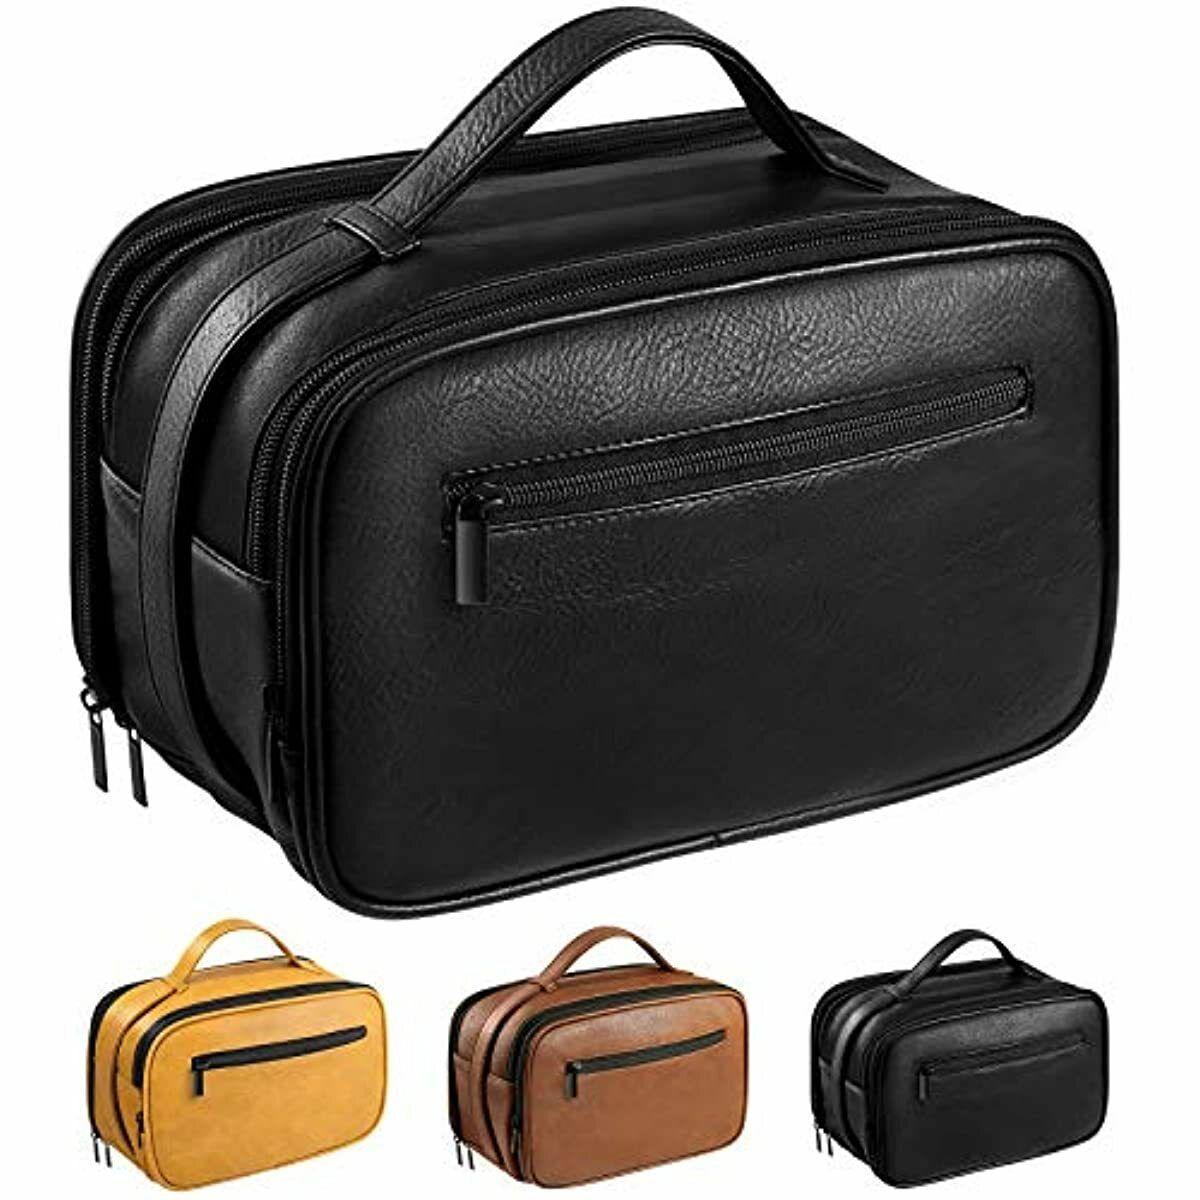 Mens Toiletry Bag, Travel Toiletry Organizer Dopp Kit Waterp